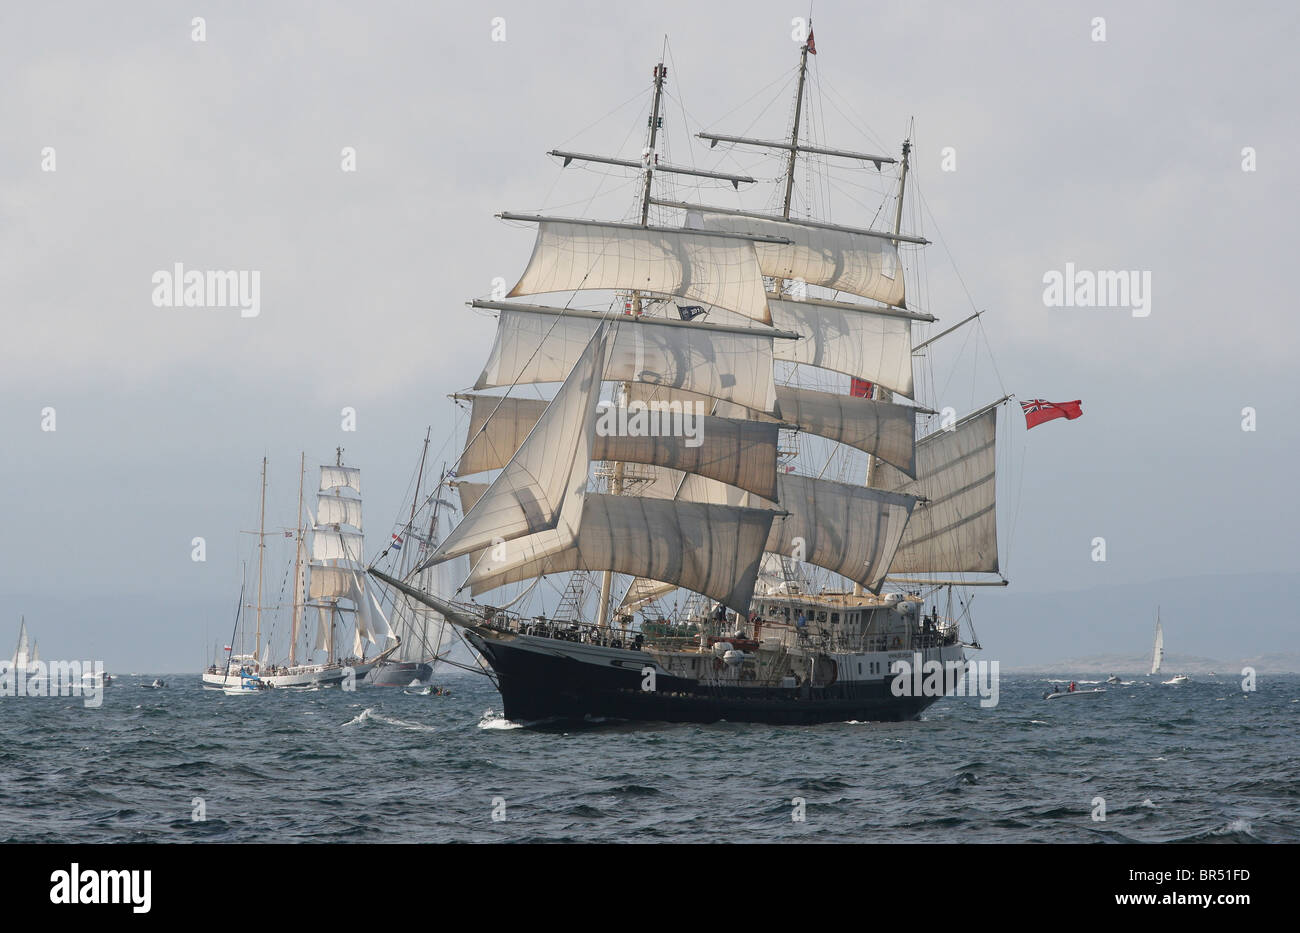 Tenacious, The Tall Ships Races 2010, Kristiansand - Stock Image